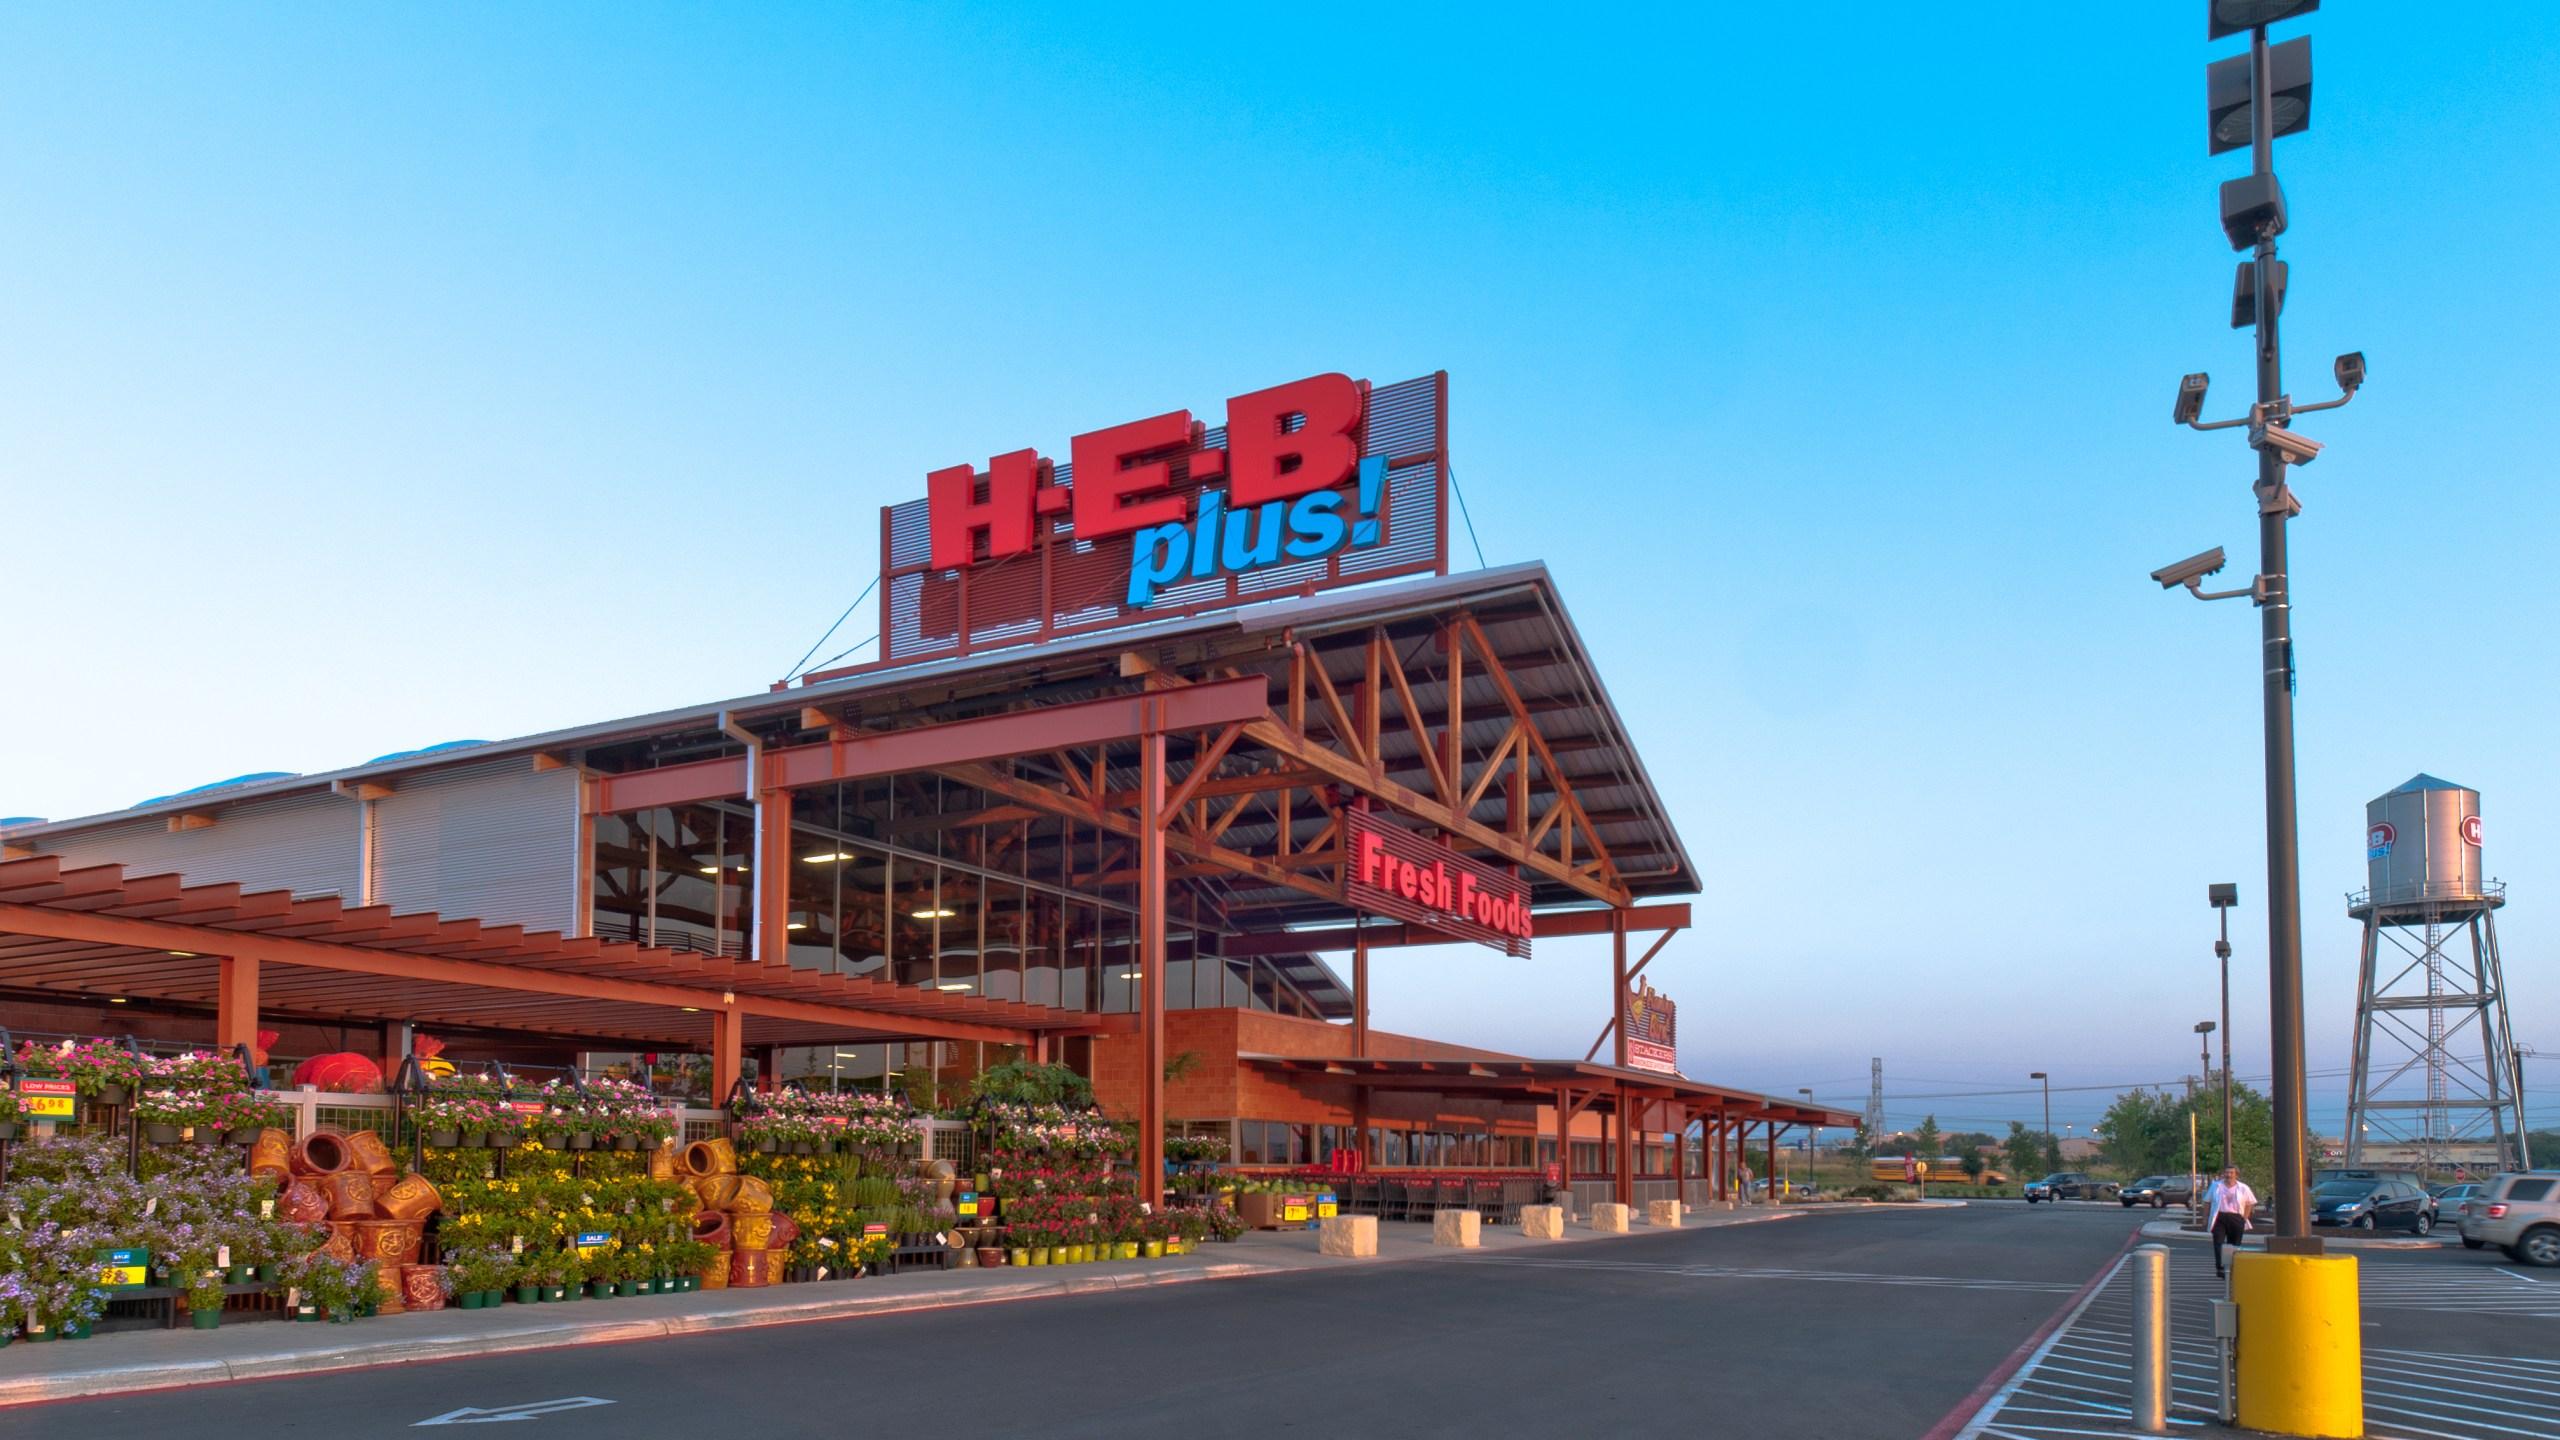 H-E-B Plus store